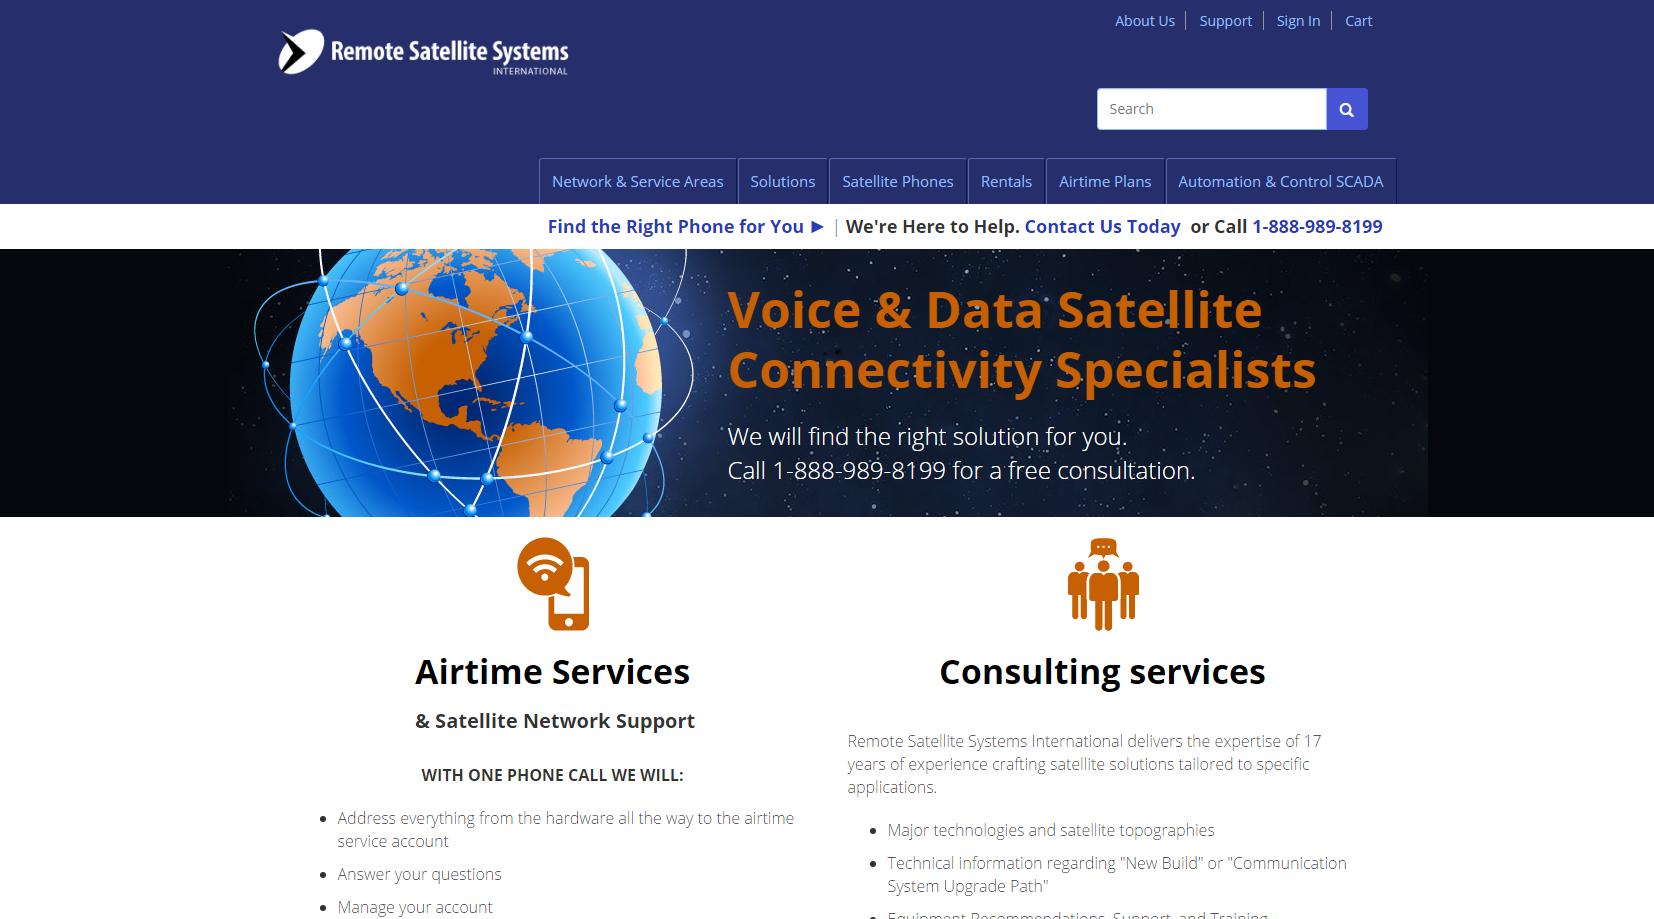 Remote_Satellite